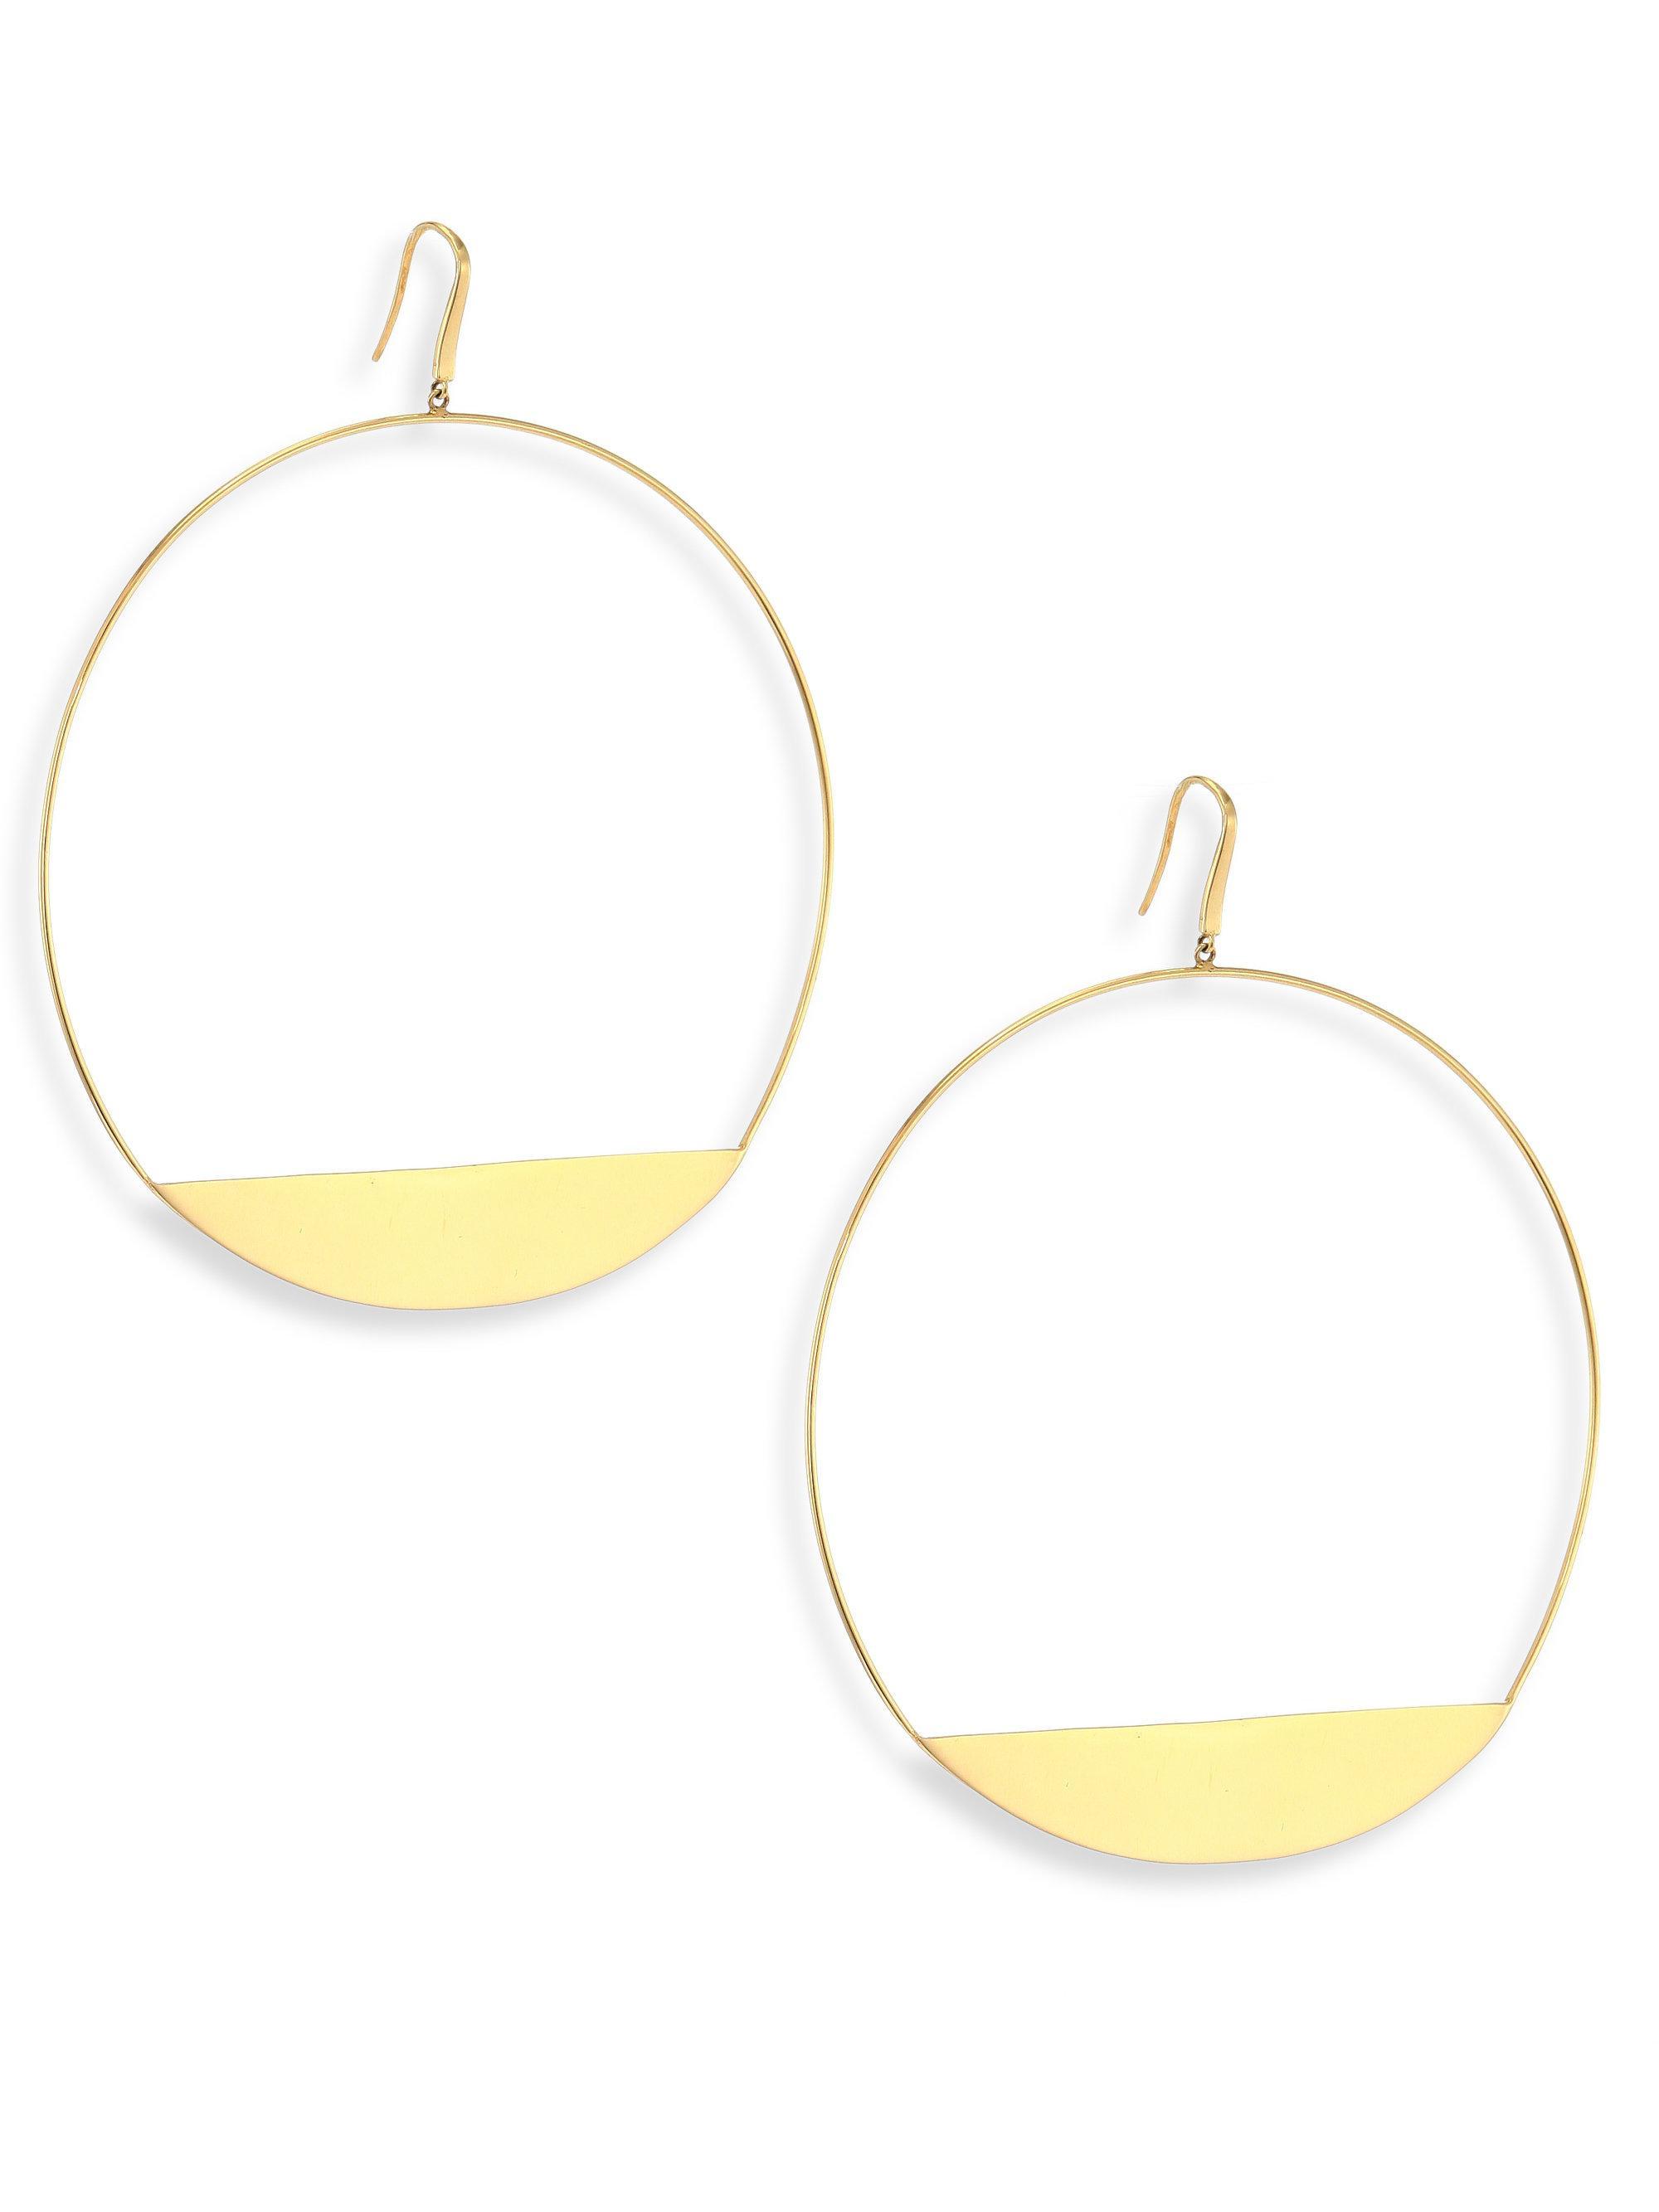 Lana Jewelry Eclipse 14K Pavé Diamond Earrings UmdUgE3wjh